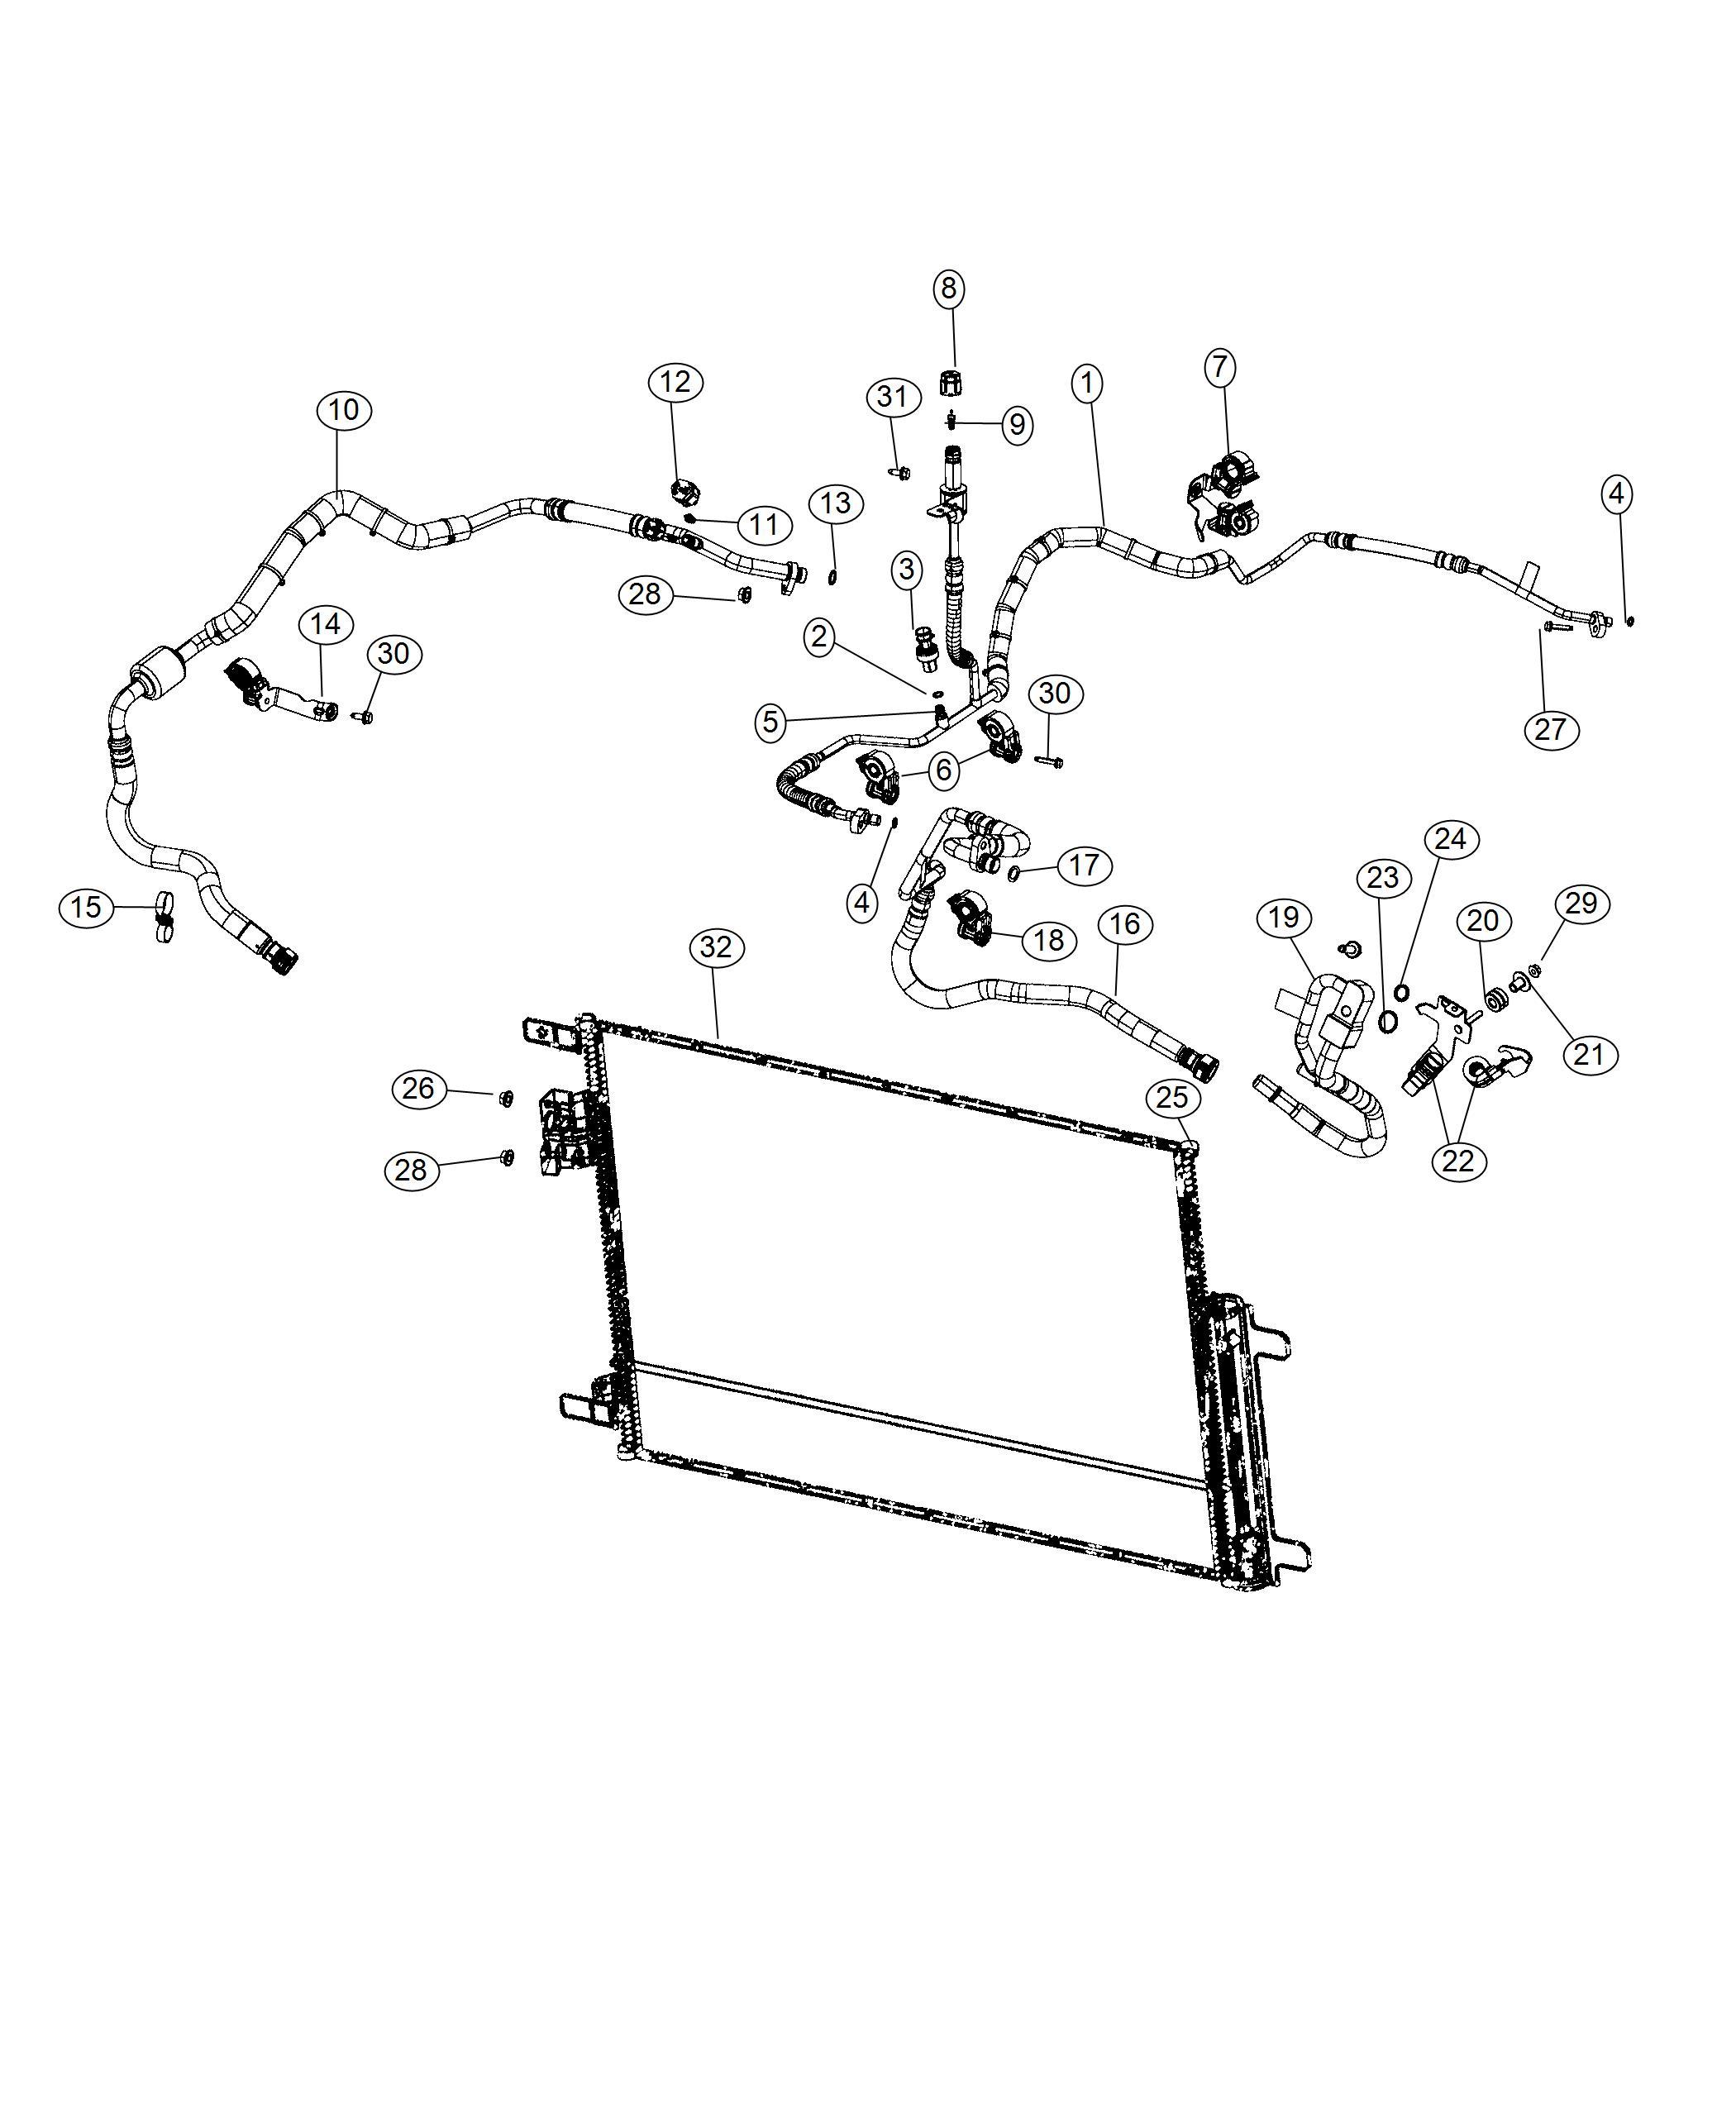 84 Jeep Cj7 2 5l Wiring Diagram - Wiring Diagrams Schema Jeep Cj Alternator Wiring on